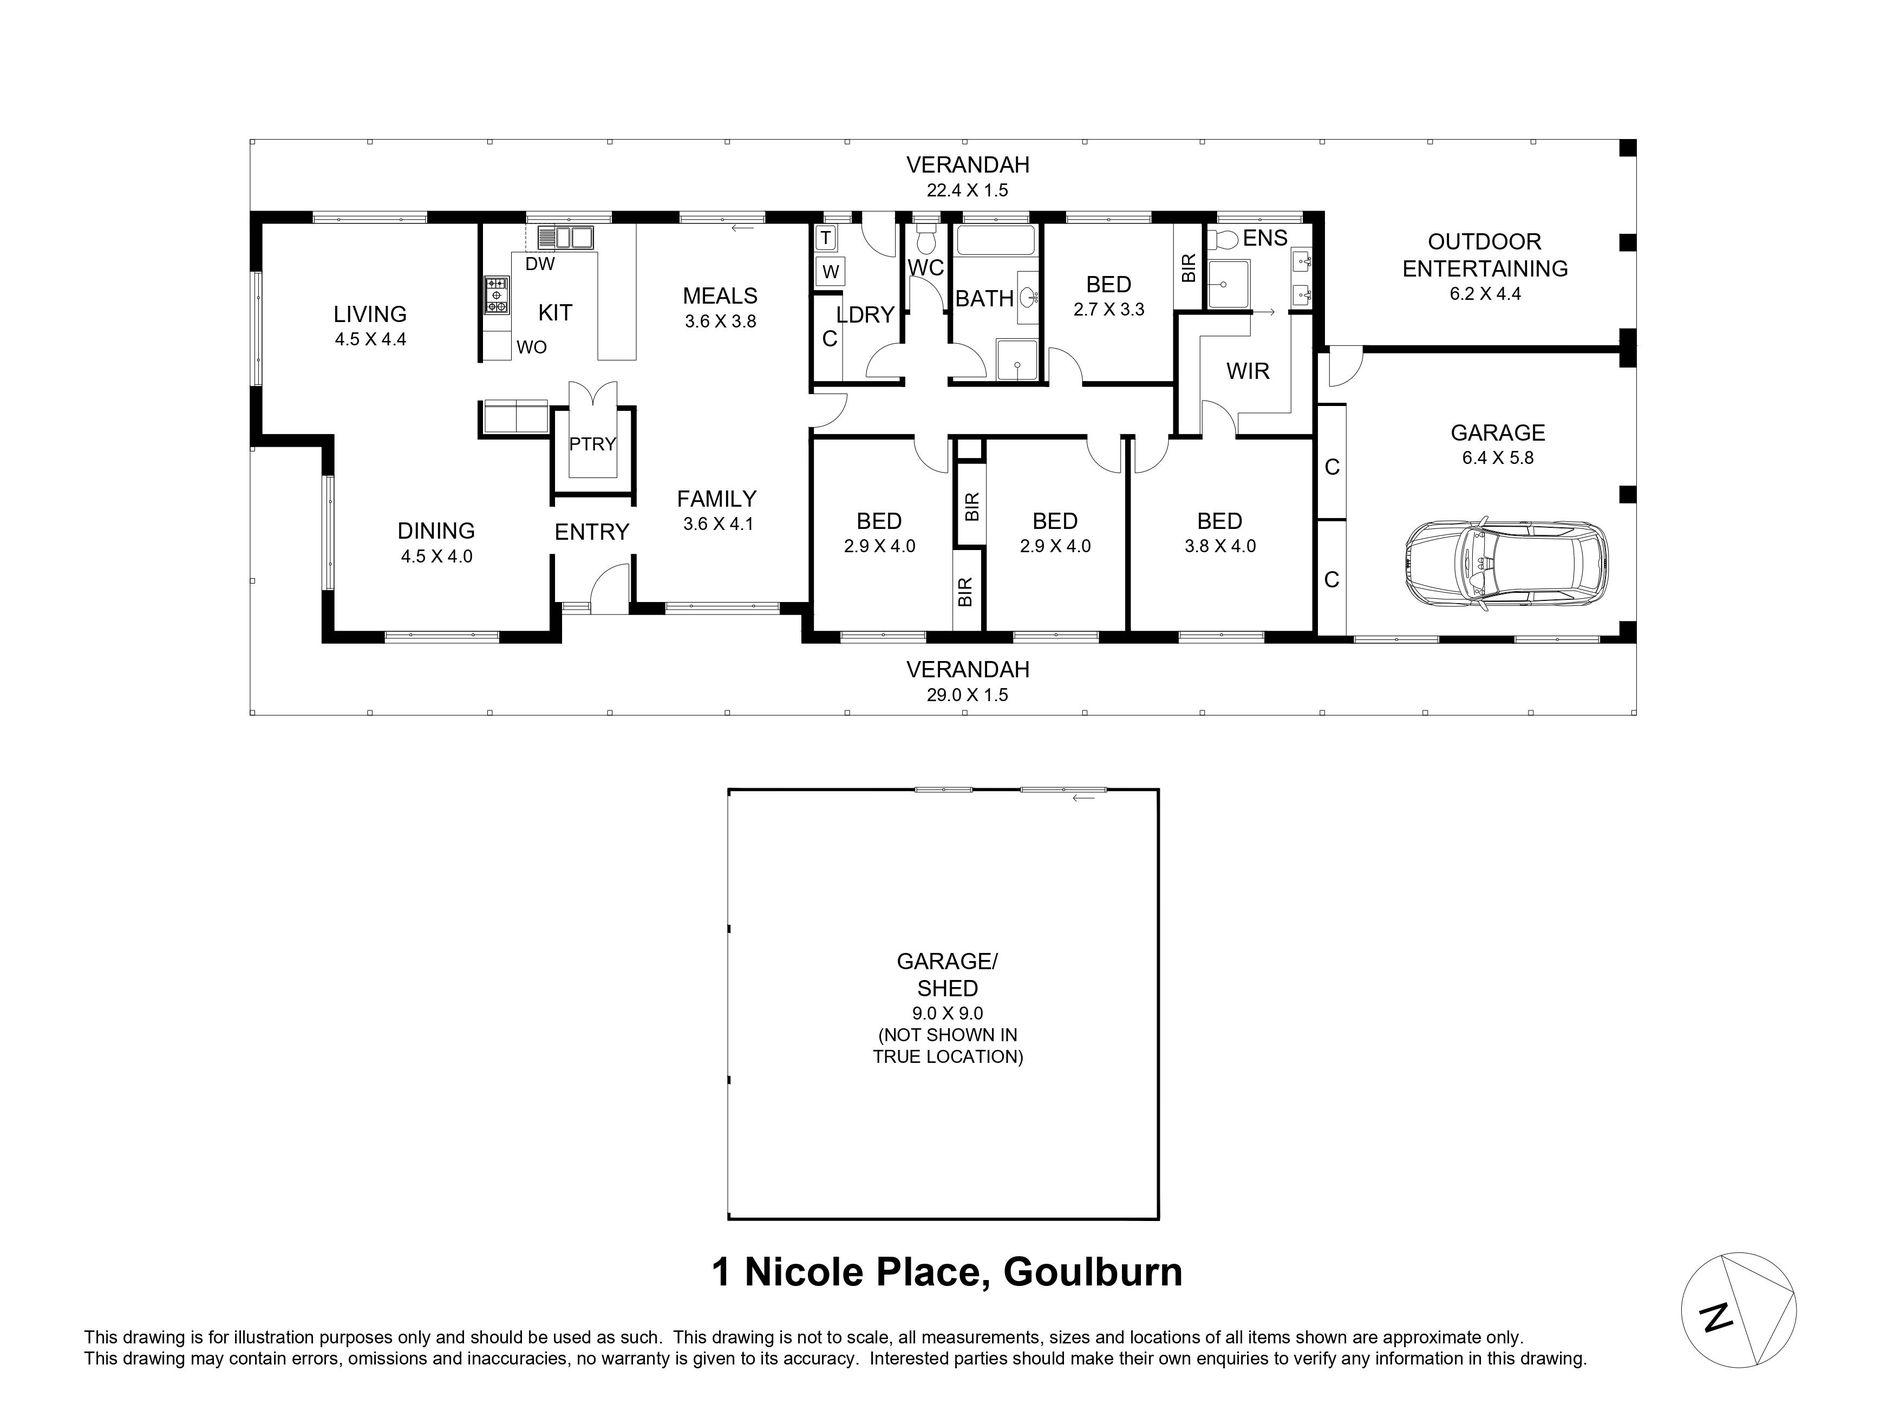 1 Nicole Place, Goulburn